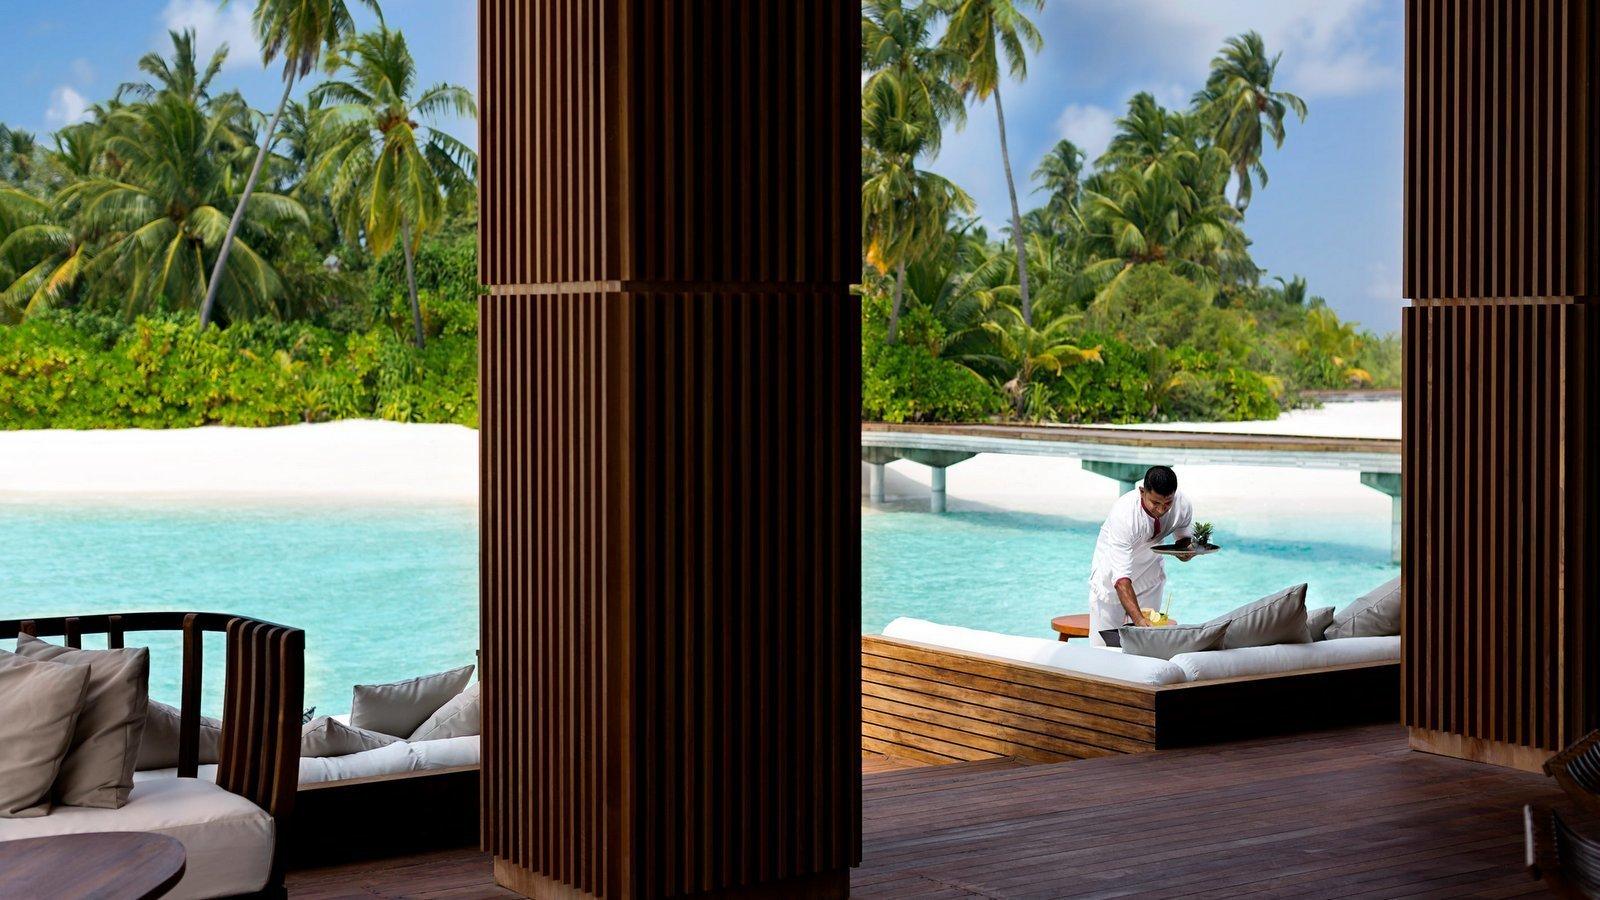 Мальдивы, отель Anantara Kihavah Maldives Villas, SkyBar